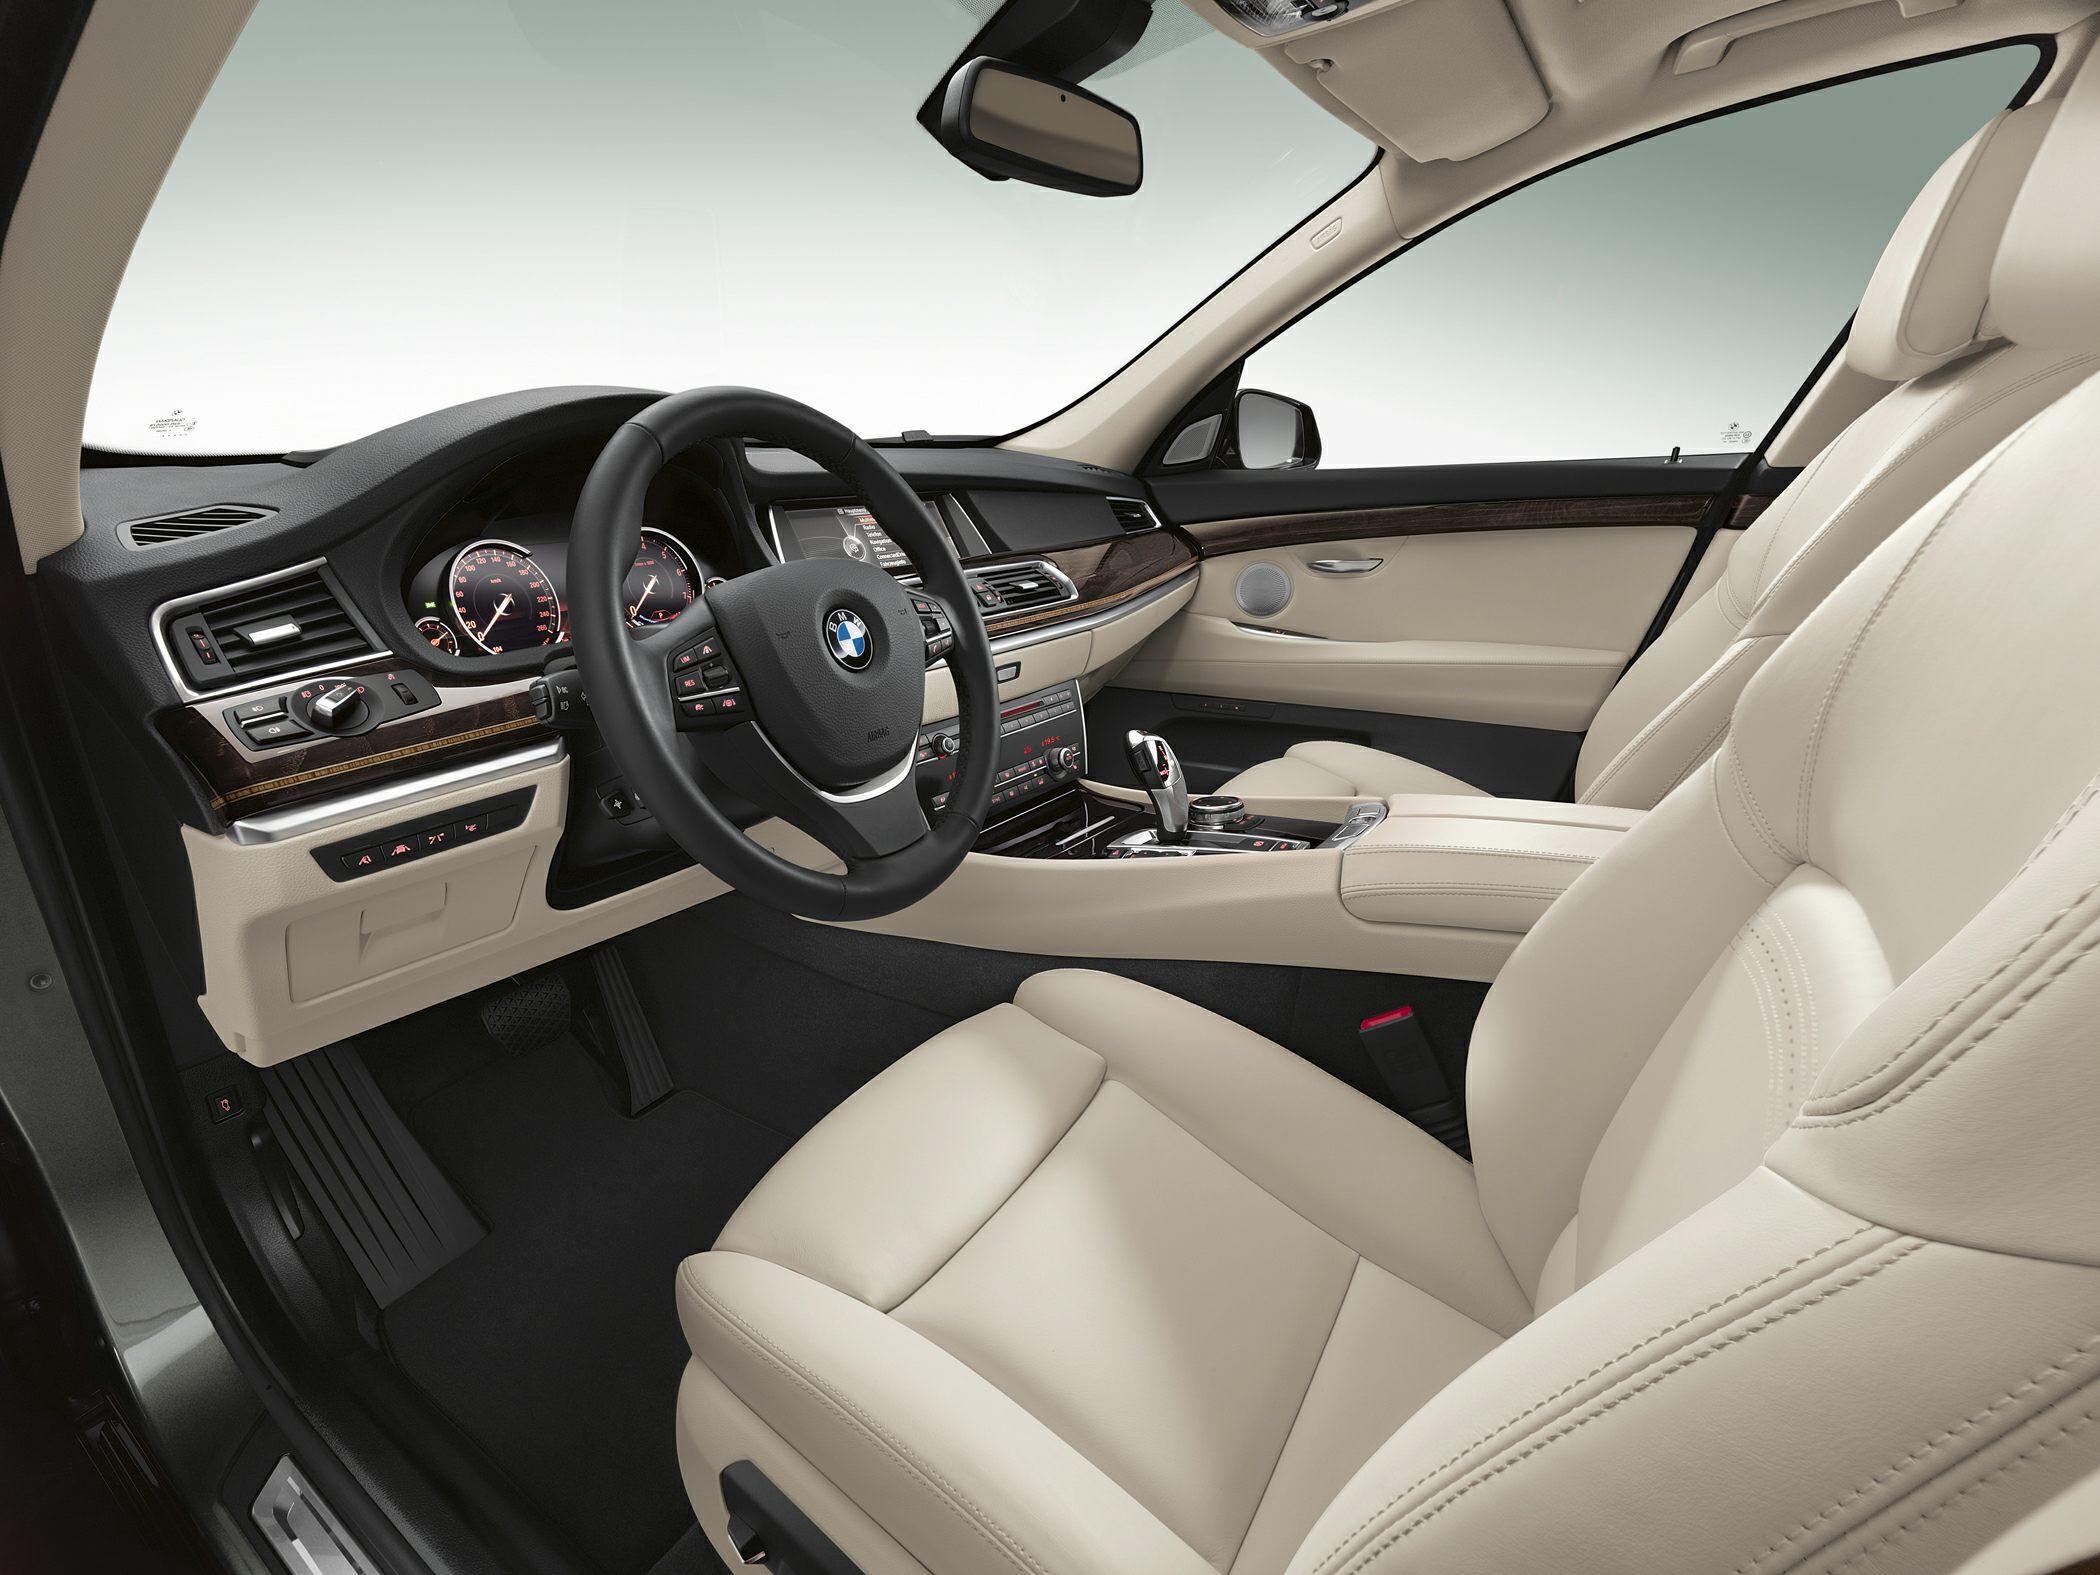 2014 BMW 550 Gran Turismo Glamour Interior